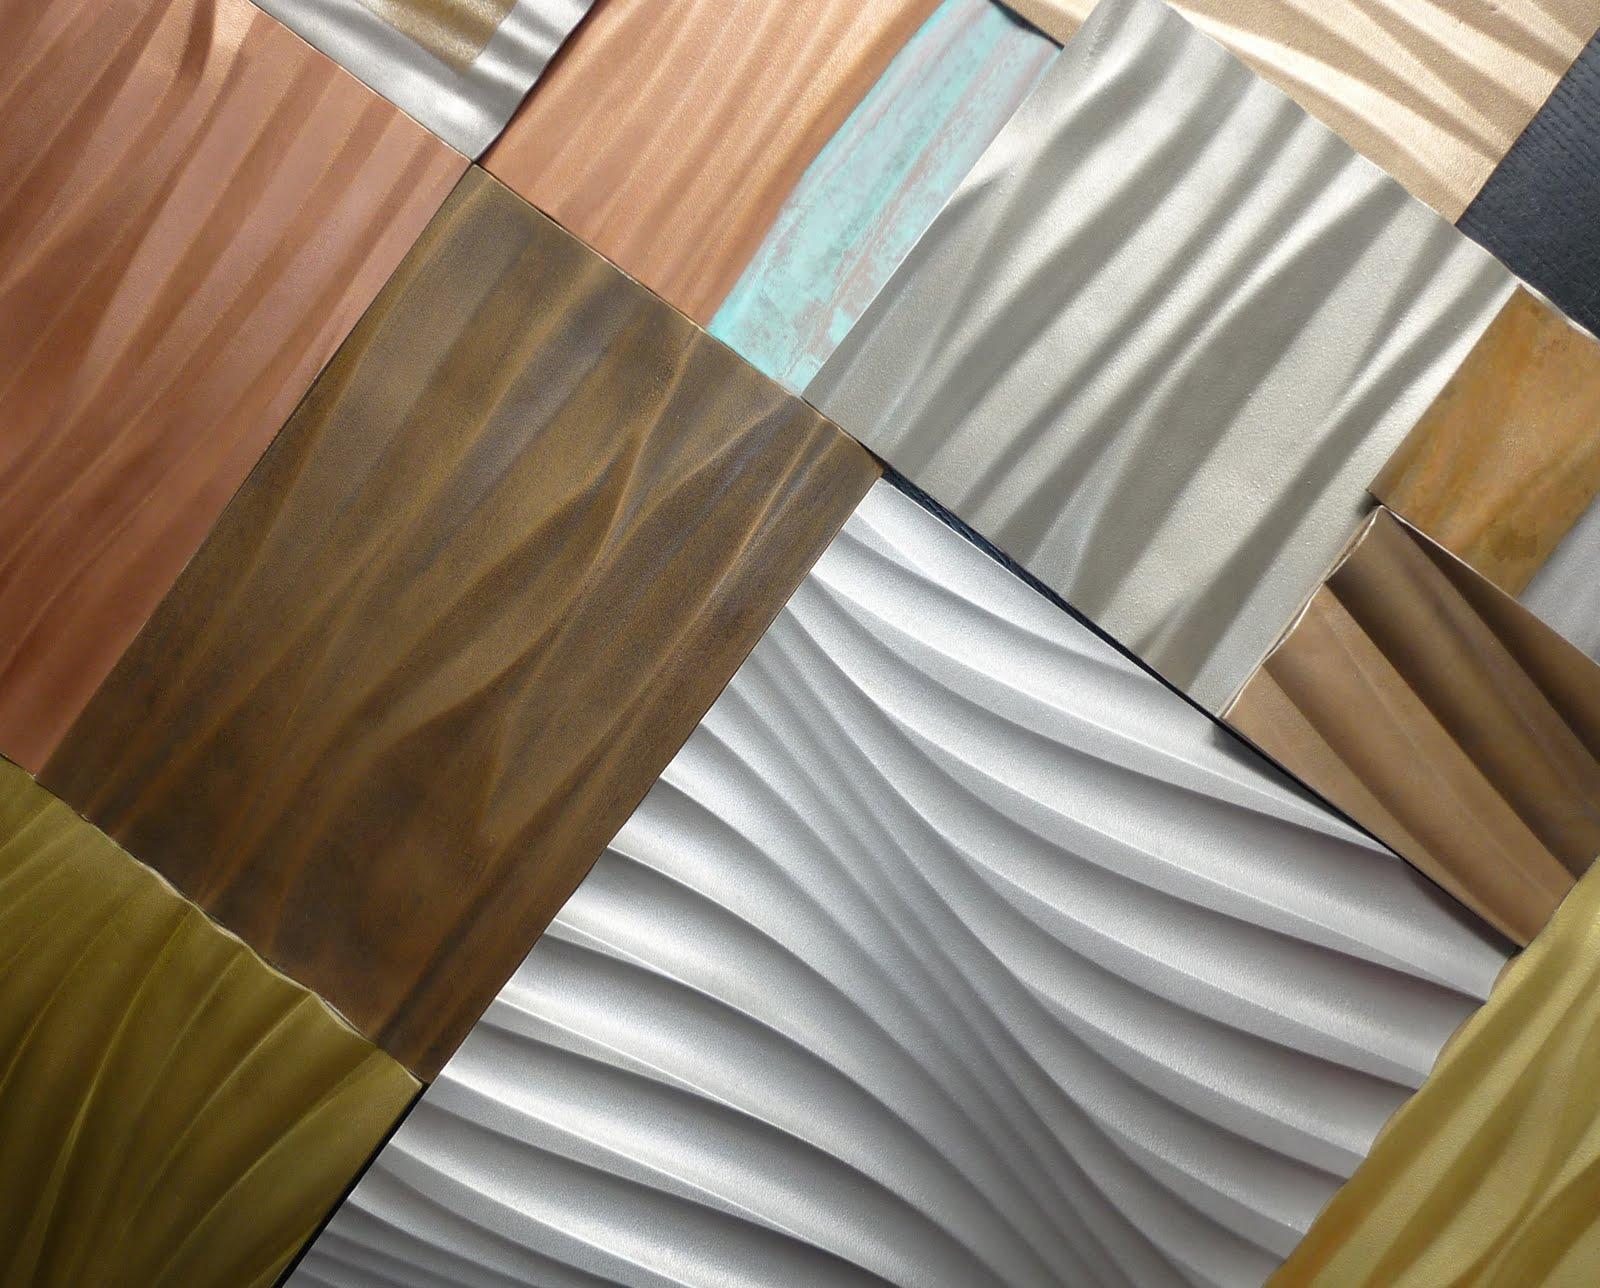 verometal beschichtung mit echtmetall aus vergrauten. Black Bedroom Furniture Sets. Home Design Ideas